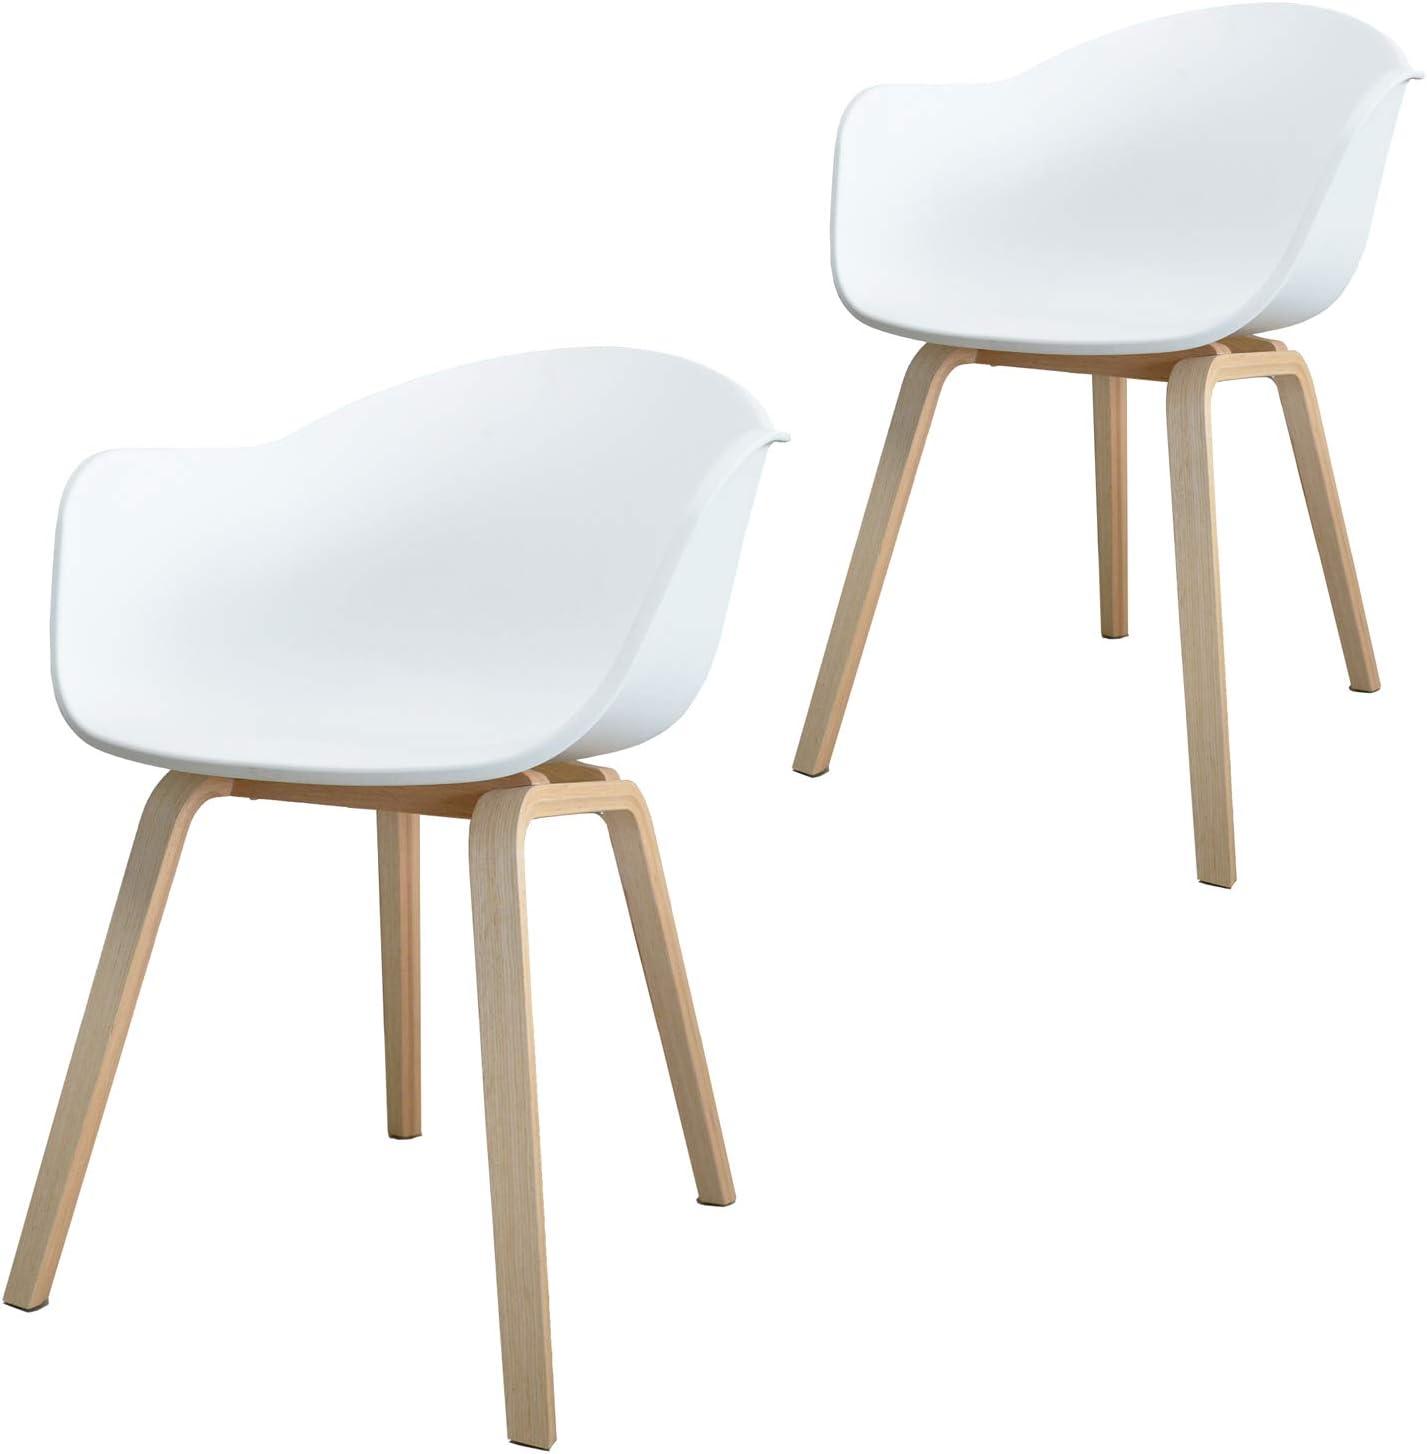 Damiware Romeo Lot de 2 chaises avec accoudoirs Tendance rétro Salle a Manger Blanches (Blanc)